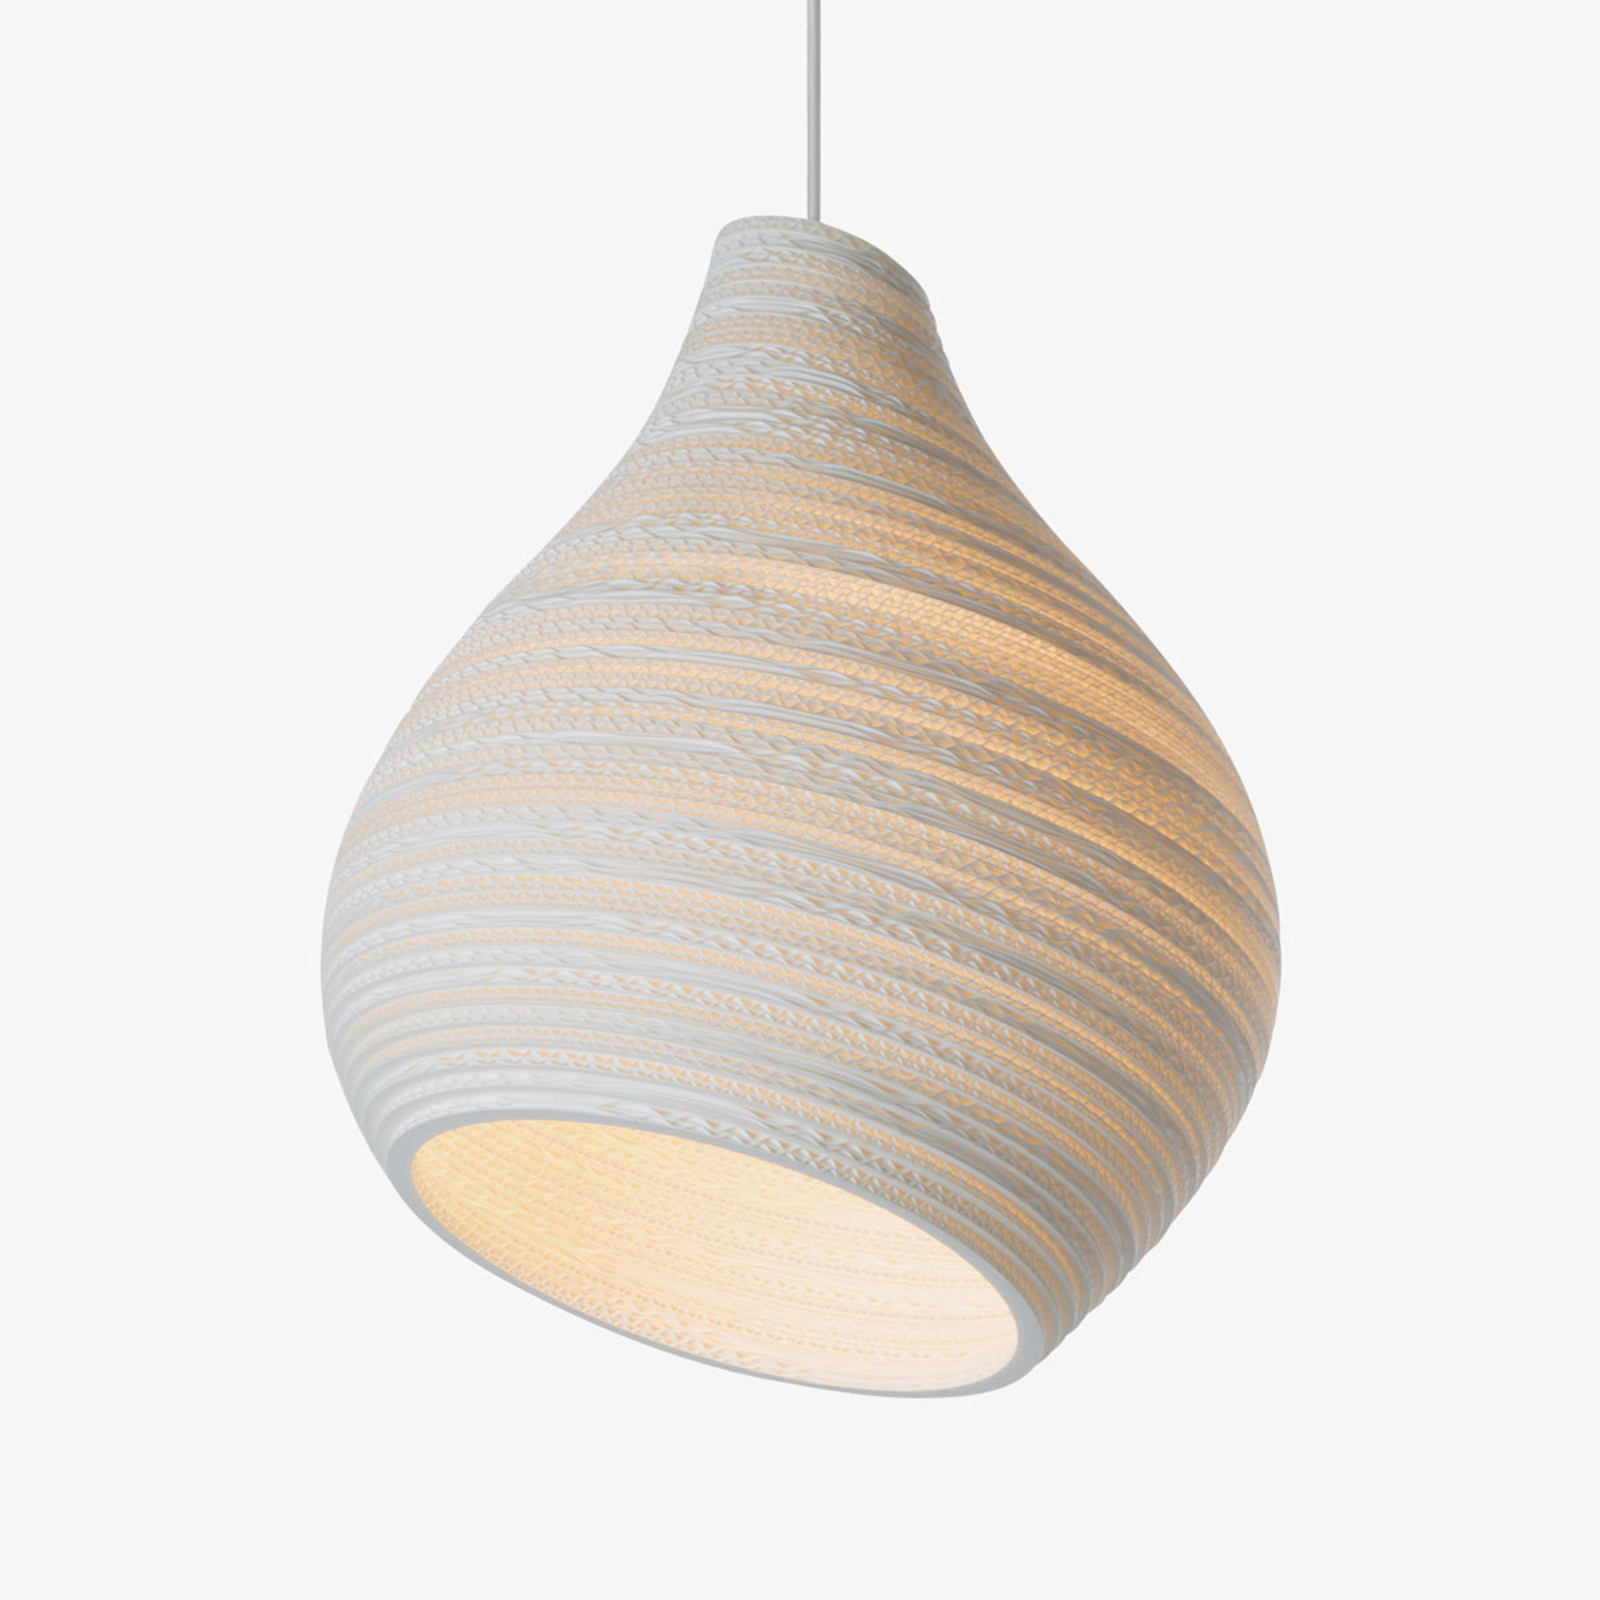 Hanglamp Hive wit Ø 38 cm